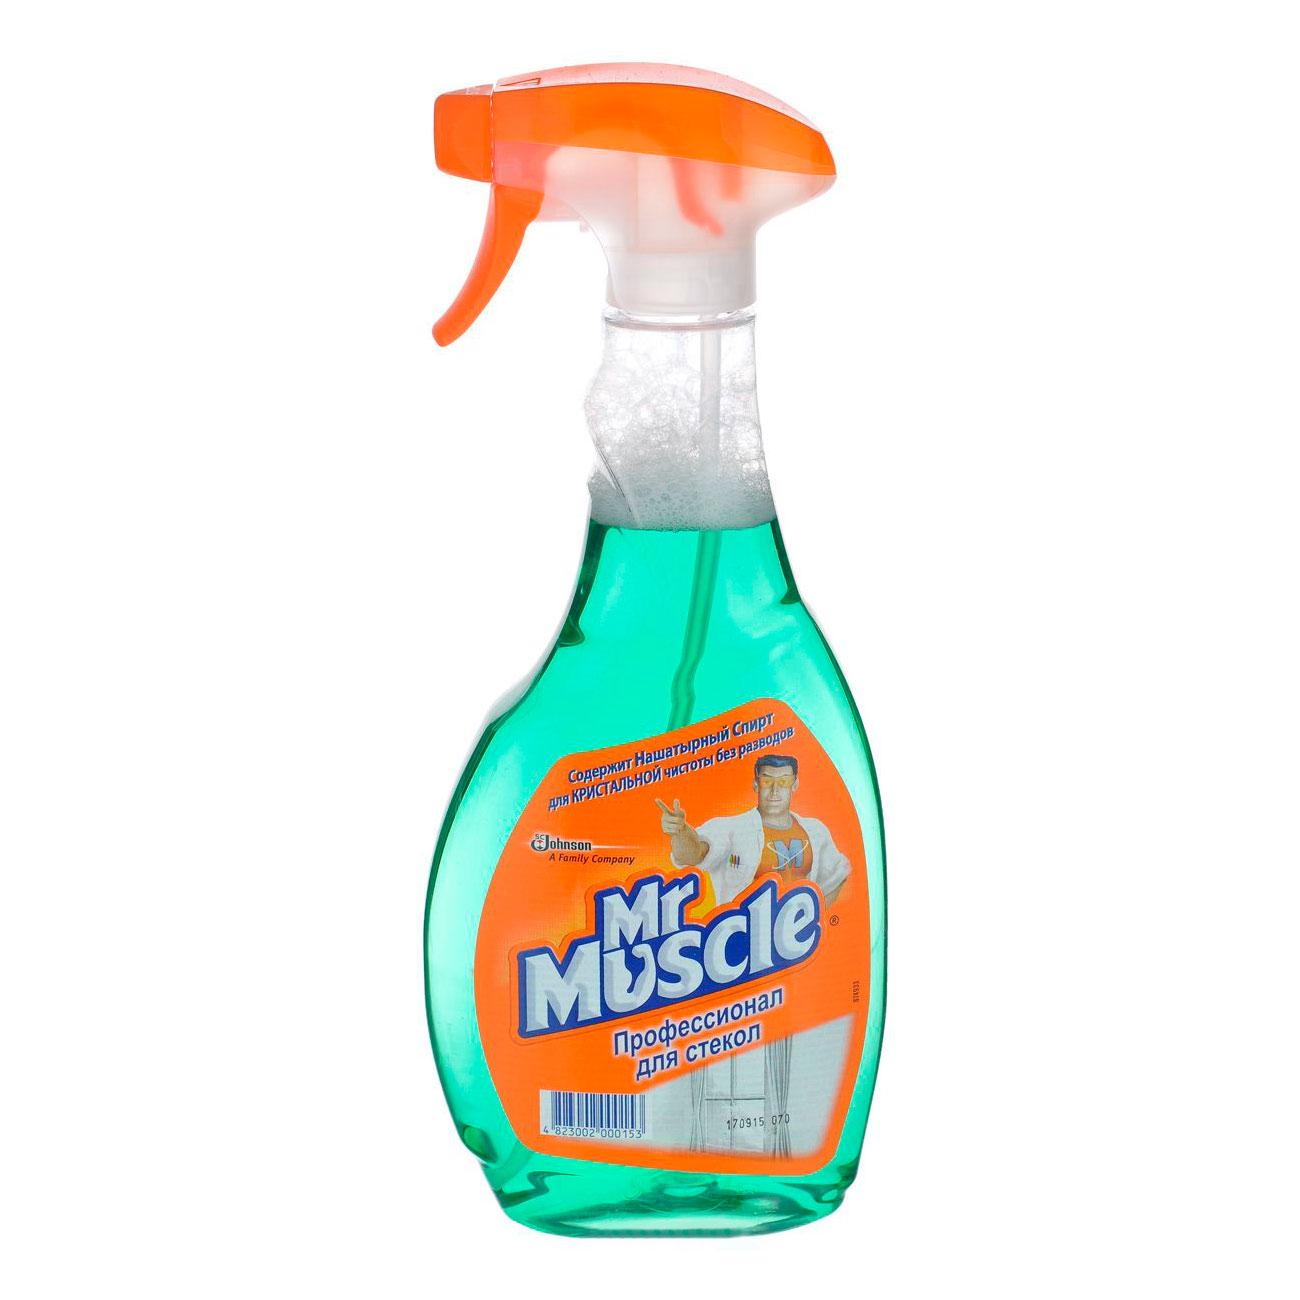 Средство Мистер Мускул триггер 500 мл для стекол с нашатырным спиртом (МИСТЕР МУСКУЛ)